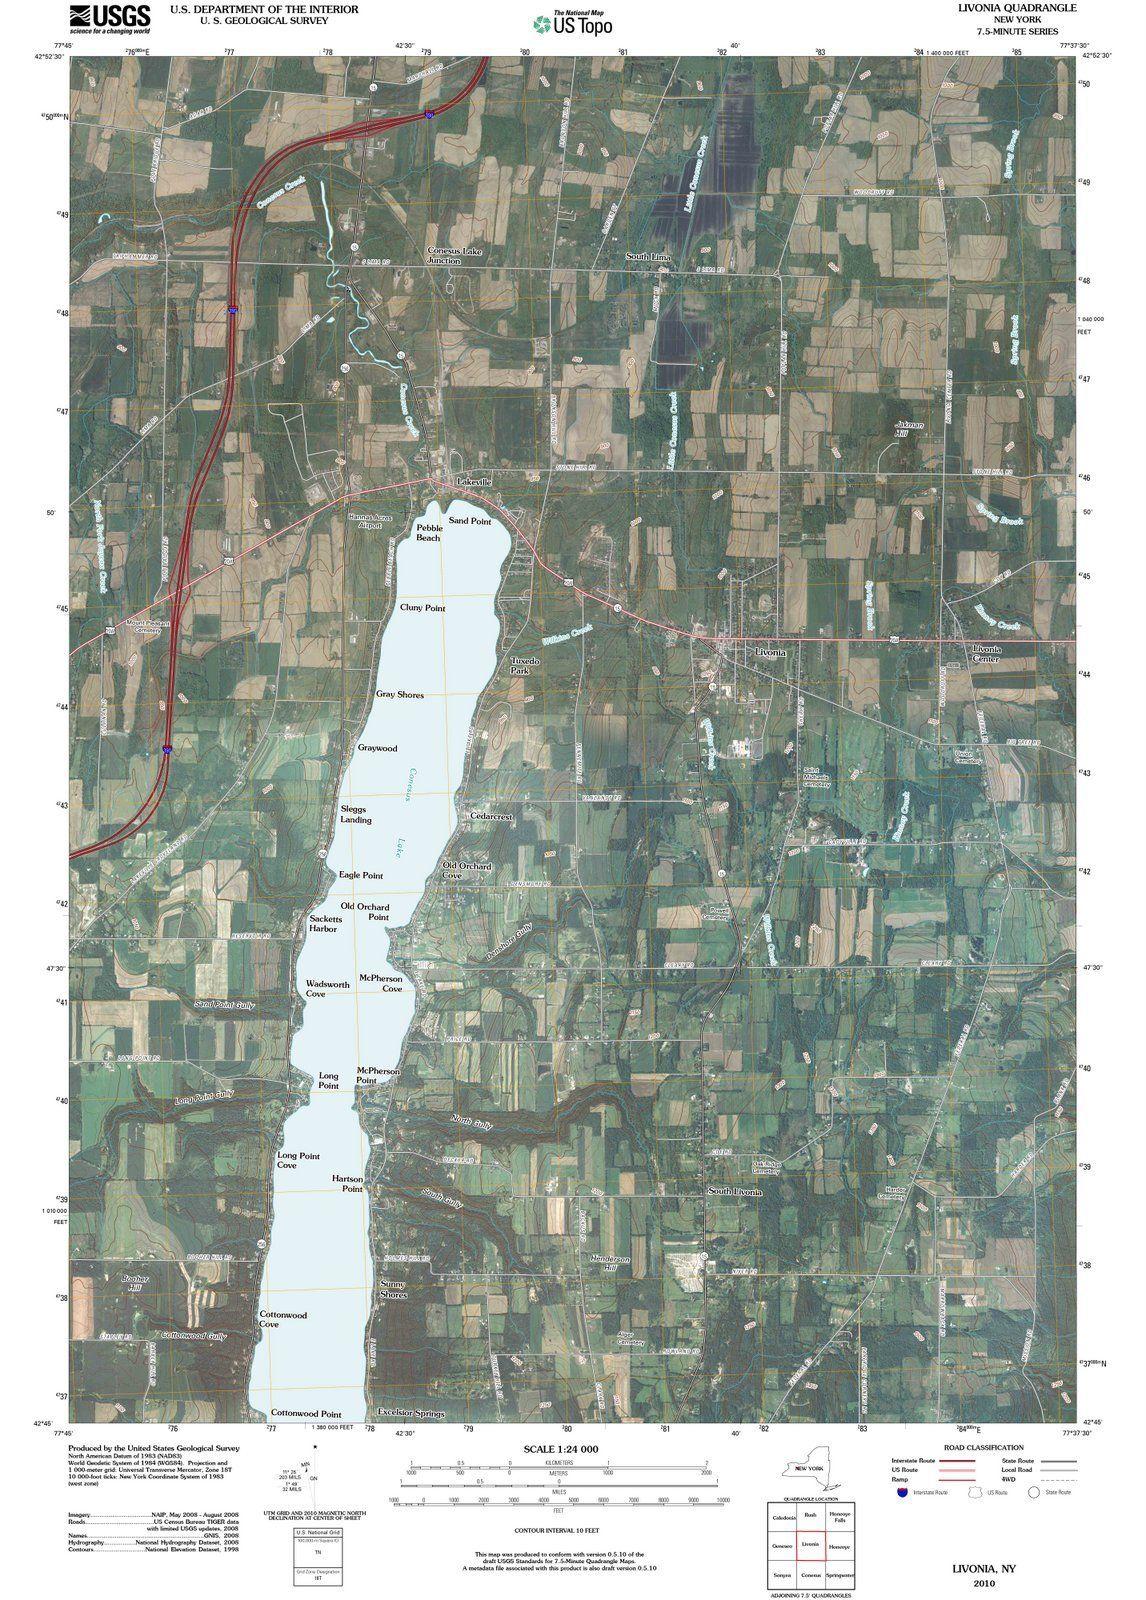 <p>2010 Livonia, NY - New York - USGS Topographic Map</p>